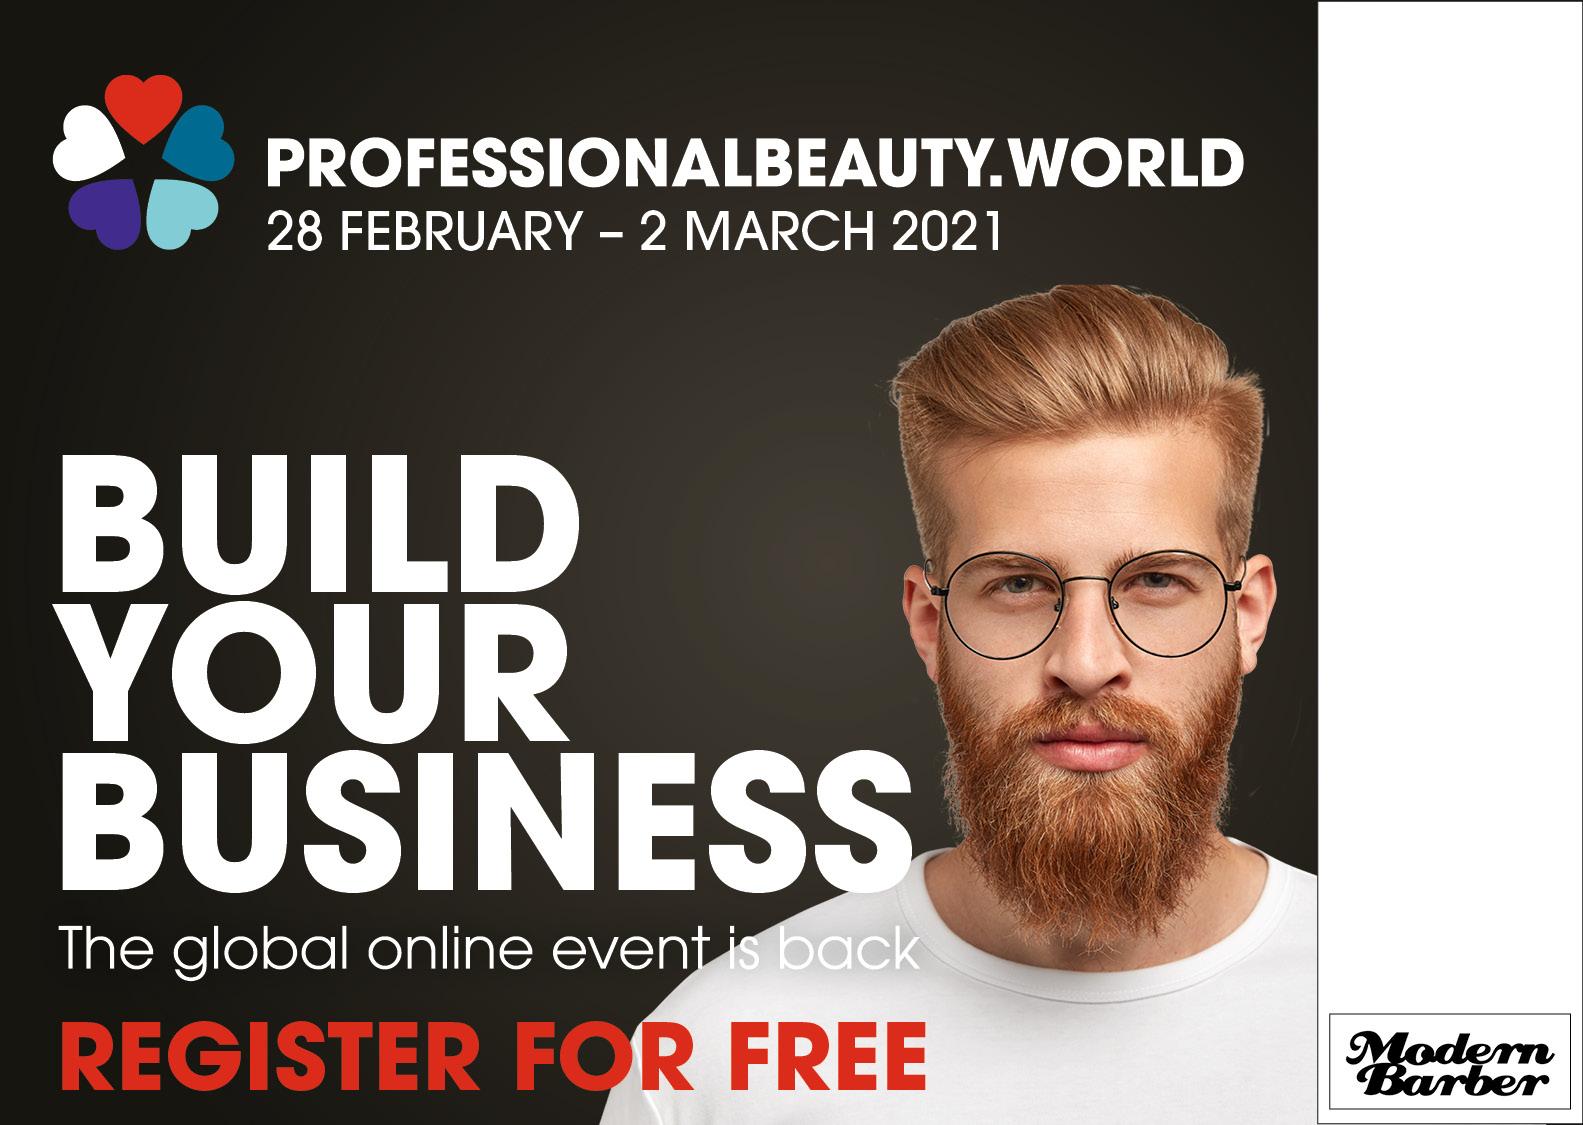 professional beauty world barber